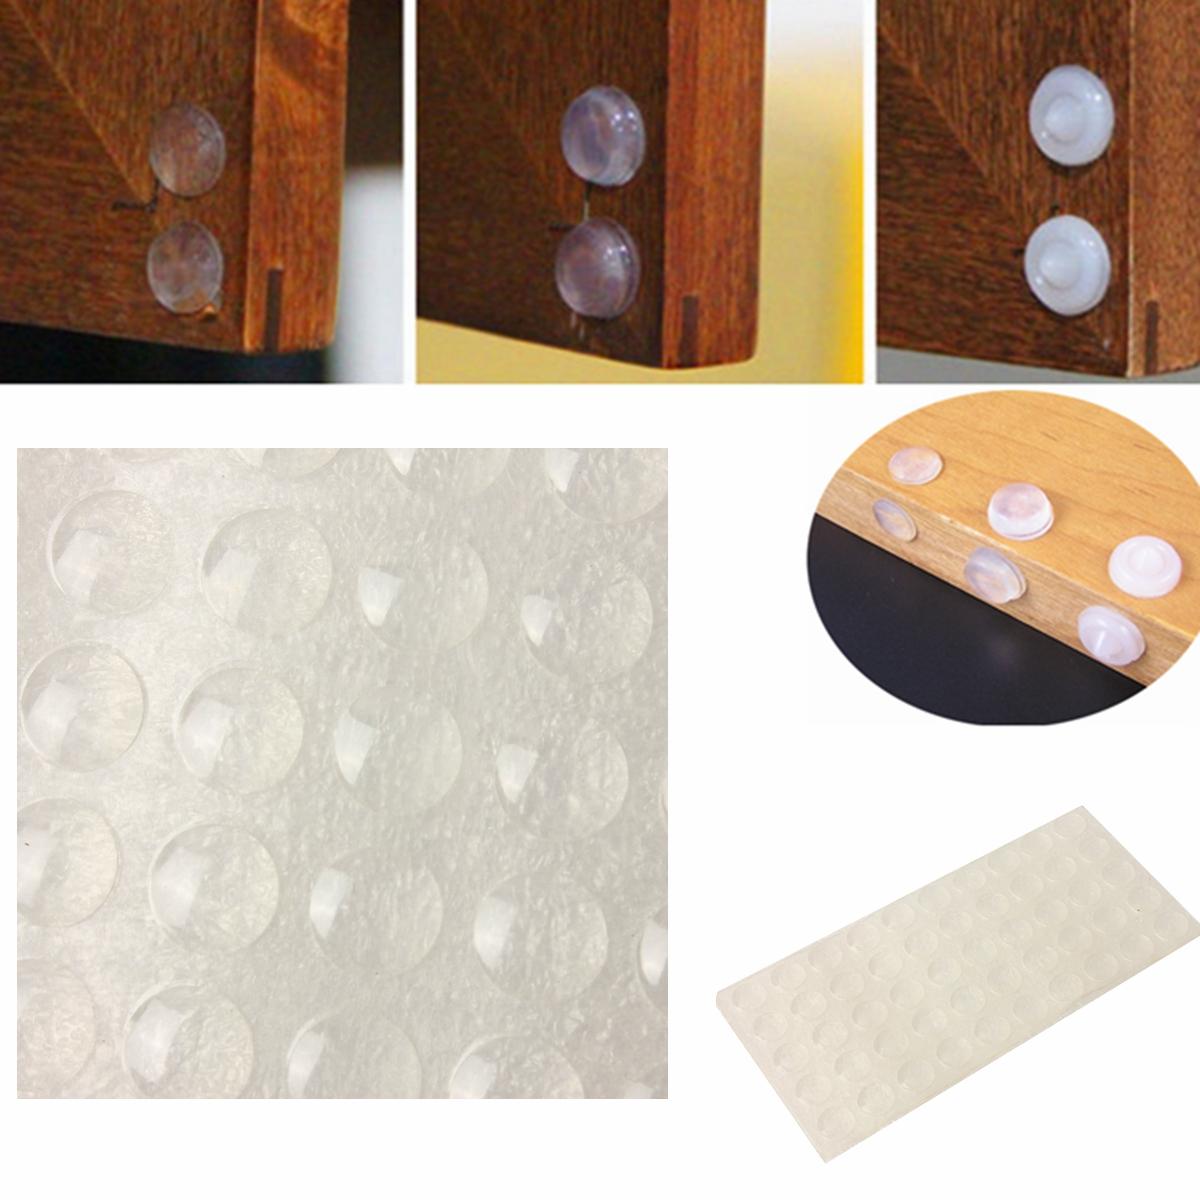 50 100pcs Self Adhesive Feet Pers Rubber Pad